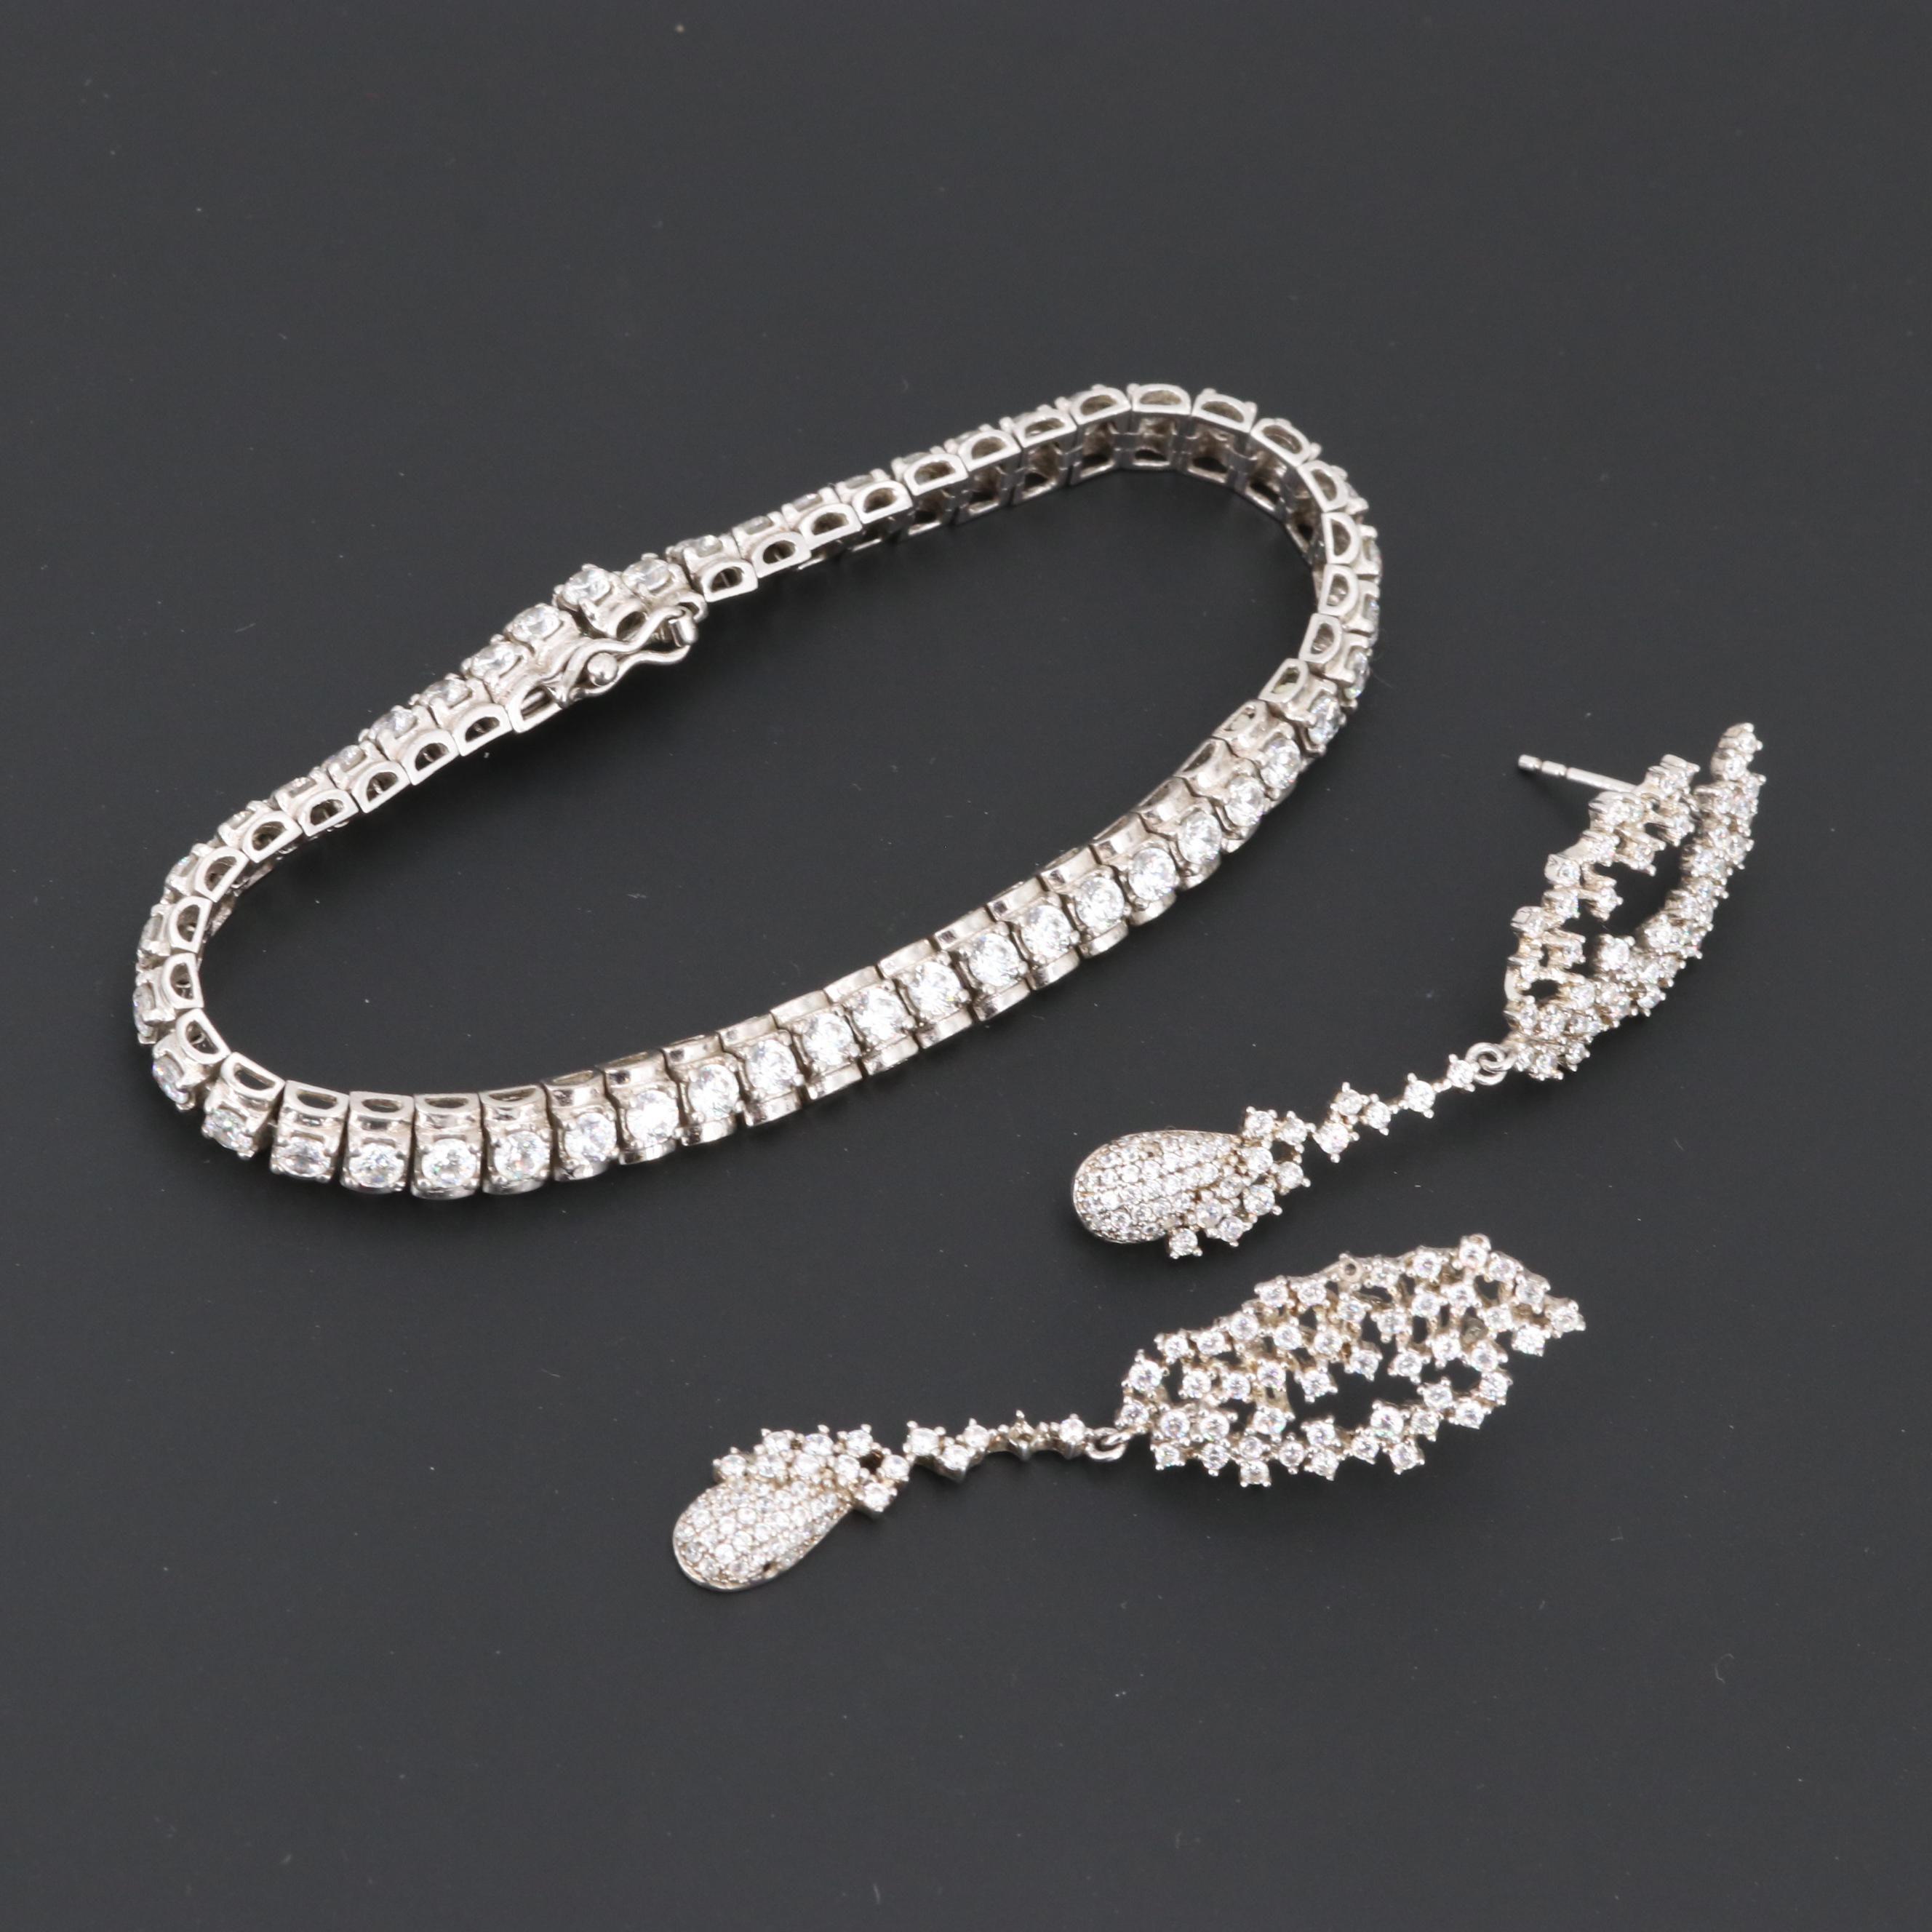 Sterling Silver Cubic Zirconia Bracelet and Earrings